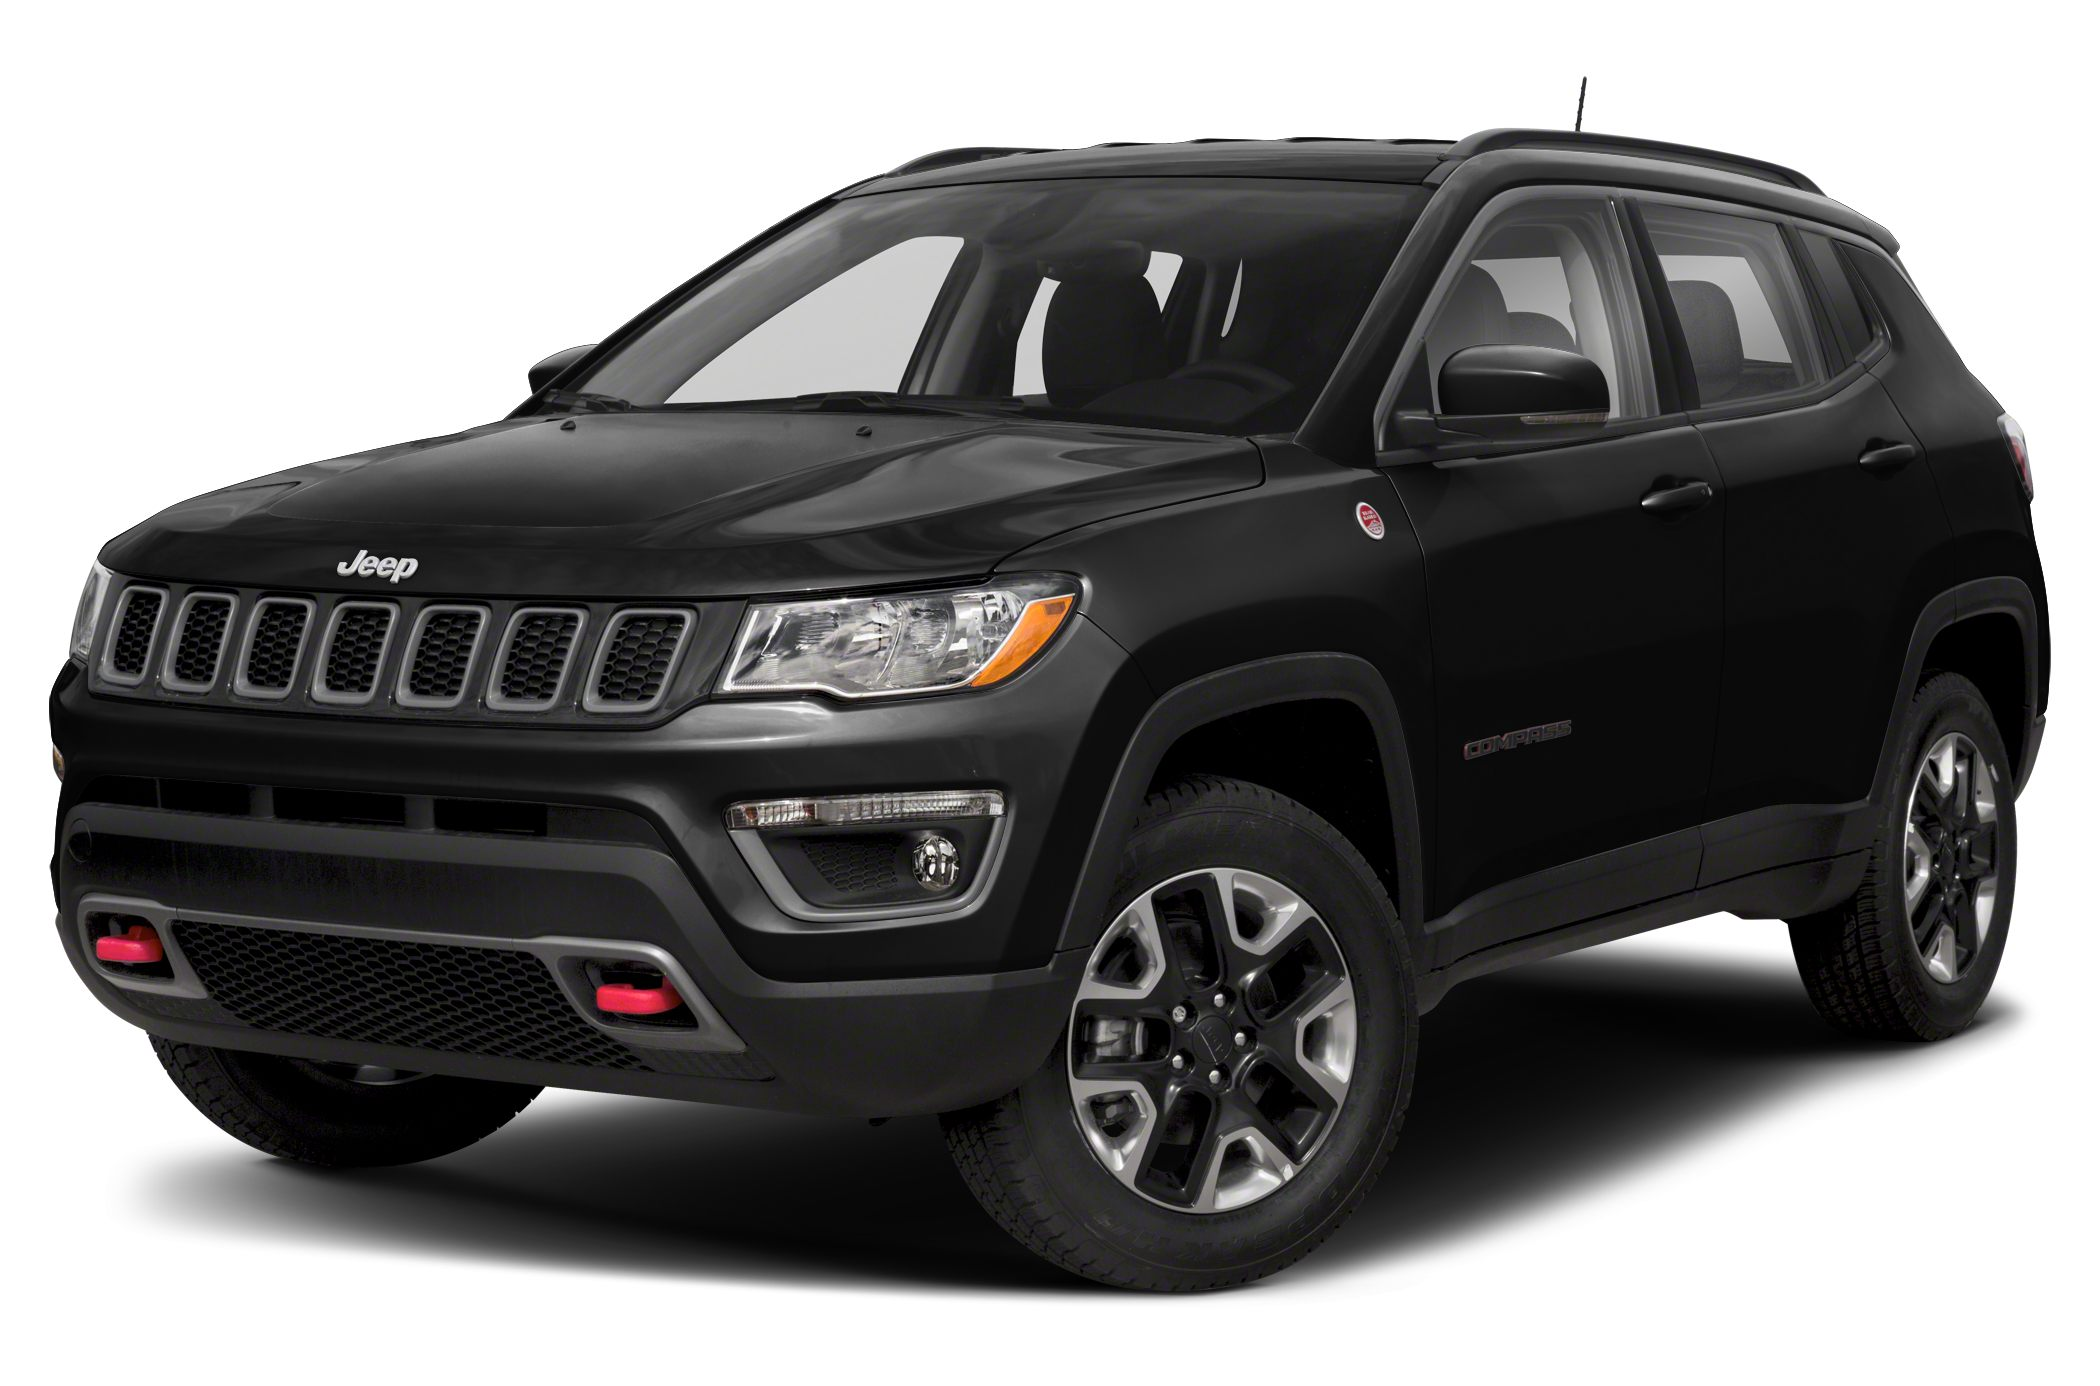 2018 Jeep Compass Trailhawk: Specs, Design, Price >> 2018 Jeep Compass Trailhawk 4dr 4x4 Pricing And Options